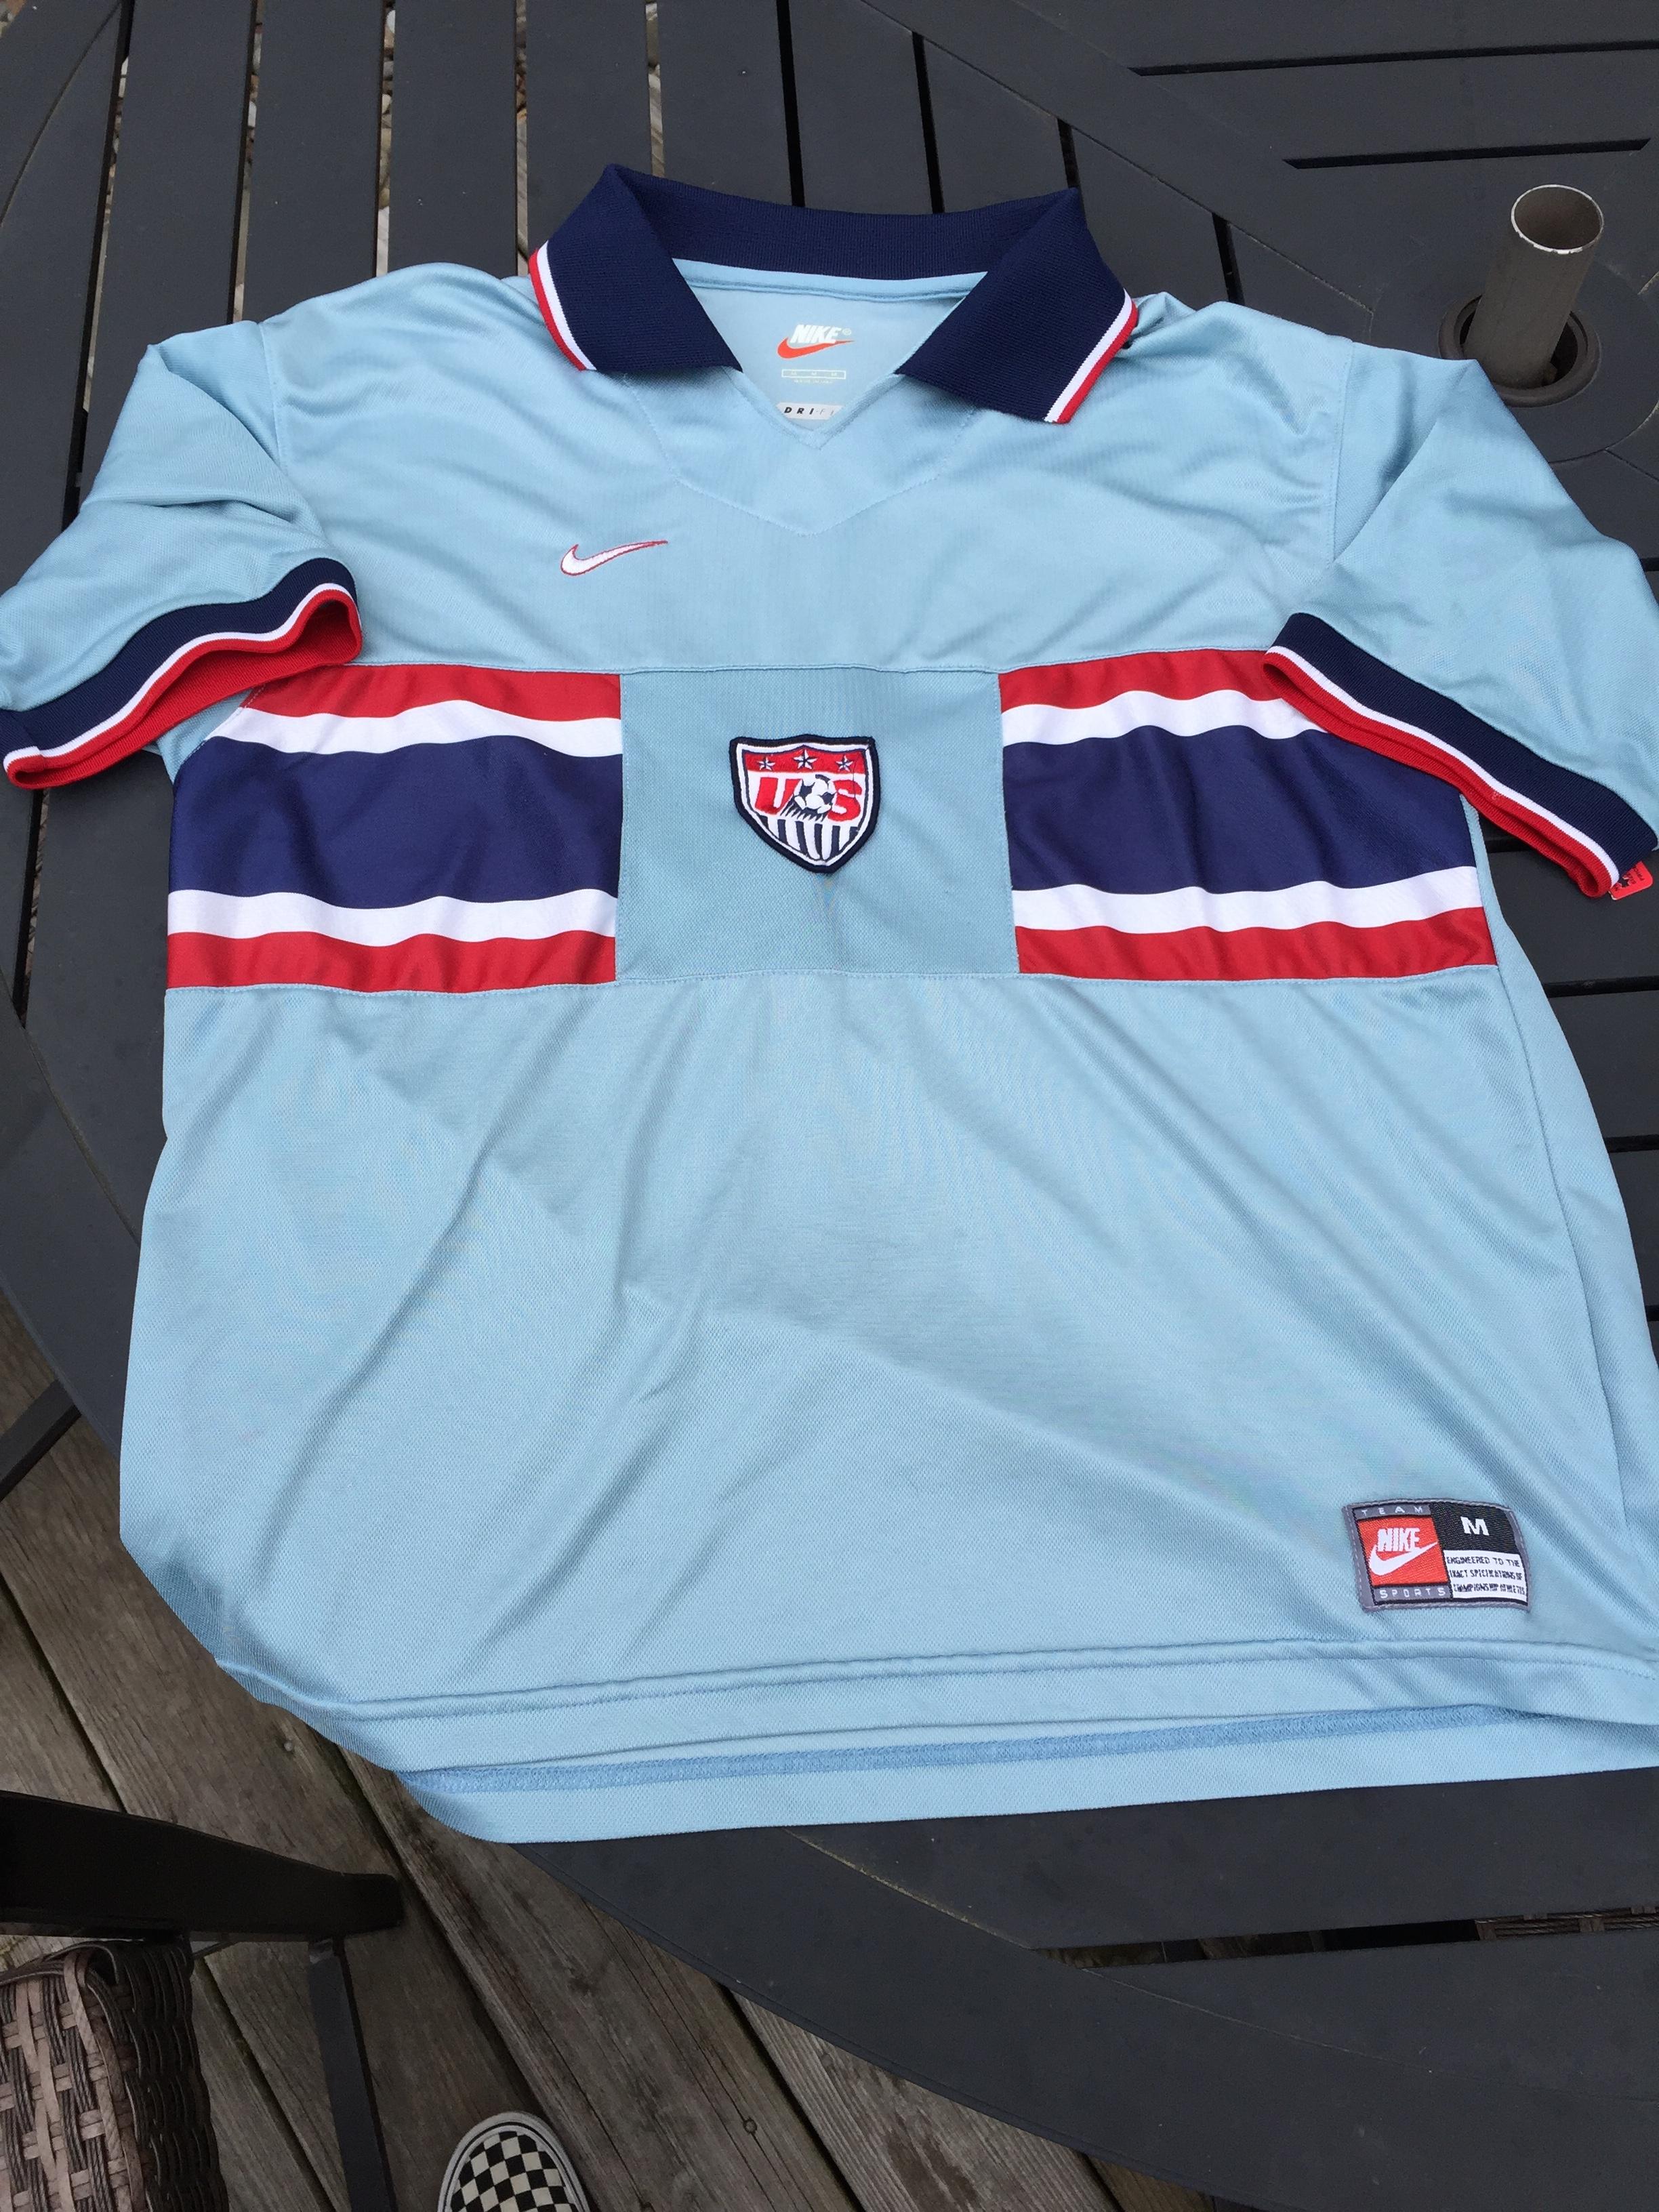 check out 88148 240c7 Vintage Soccer T Shirts - raveitsafe